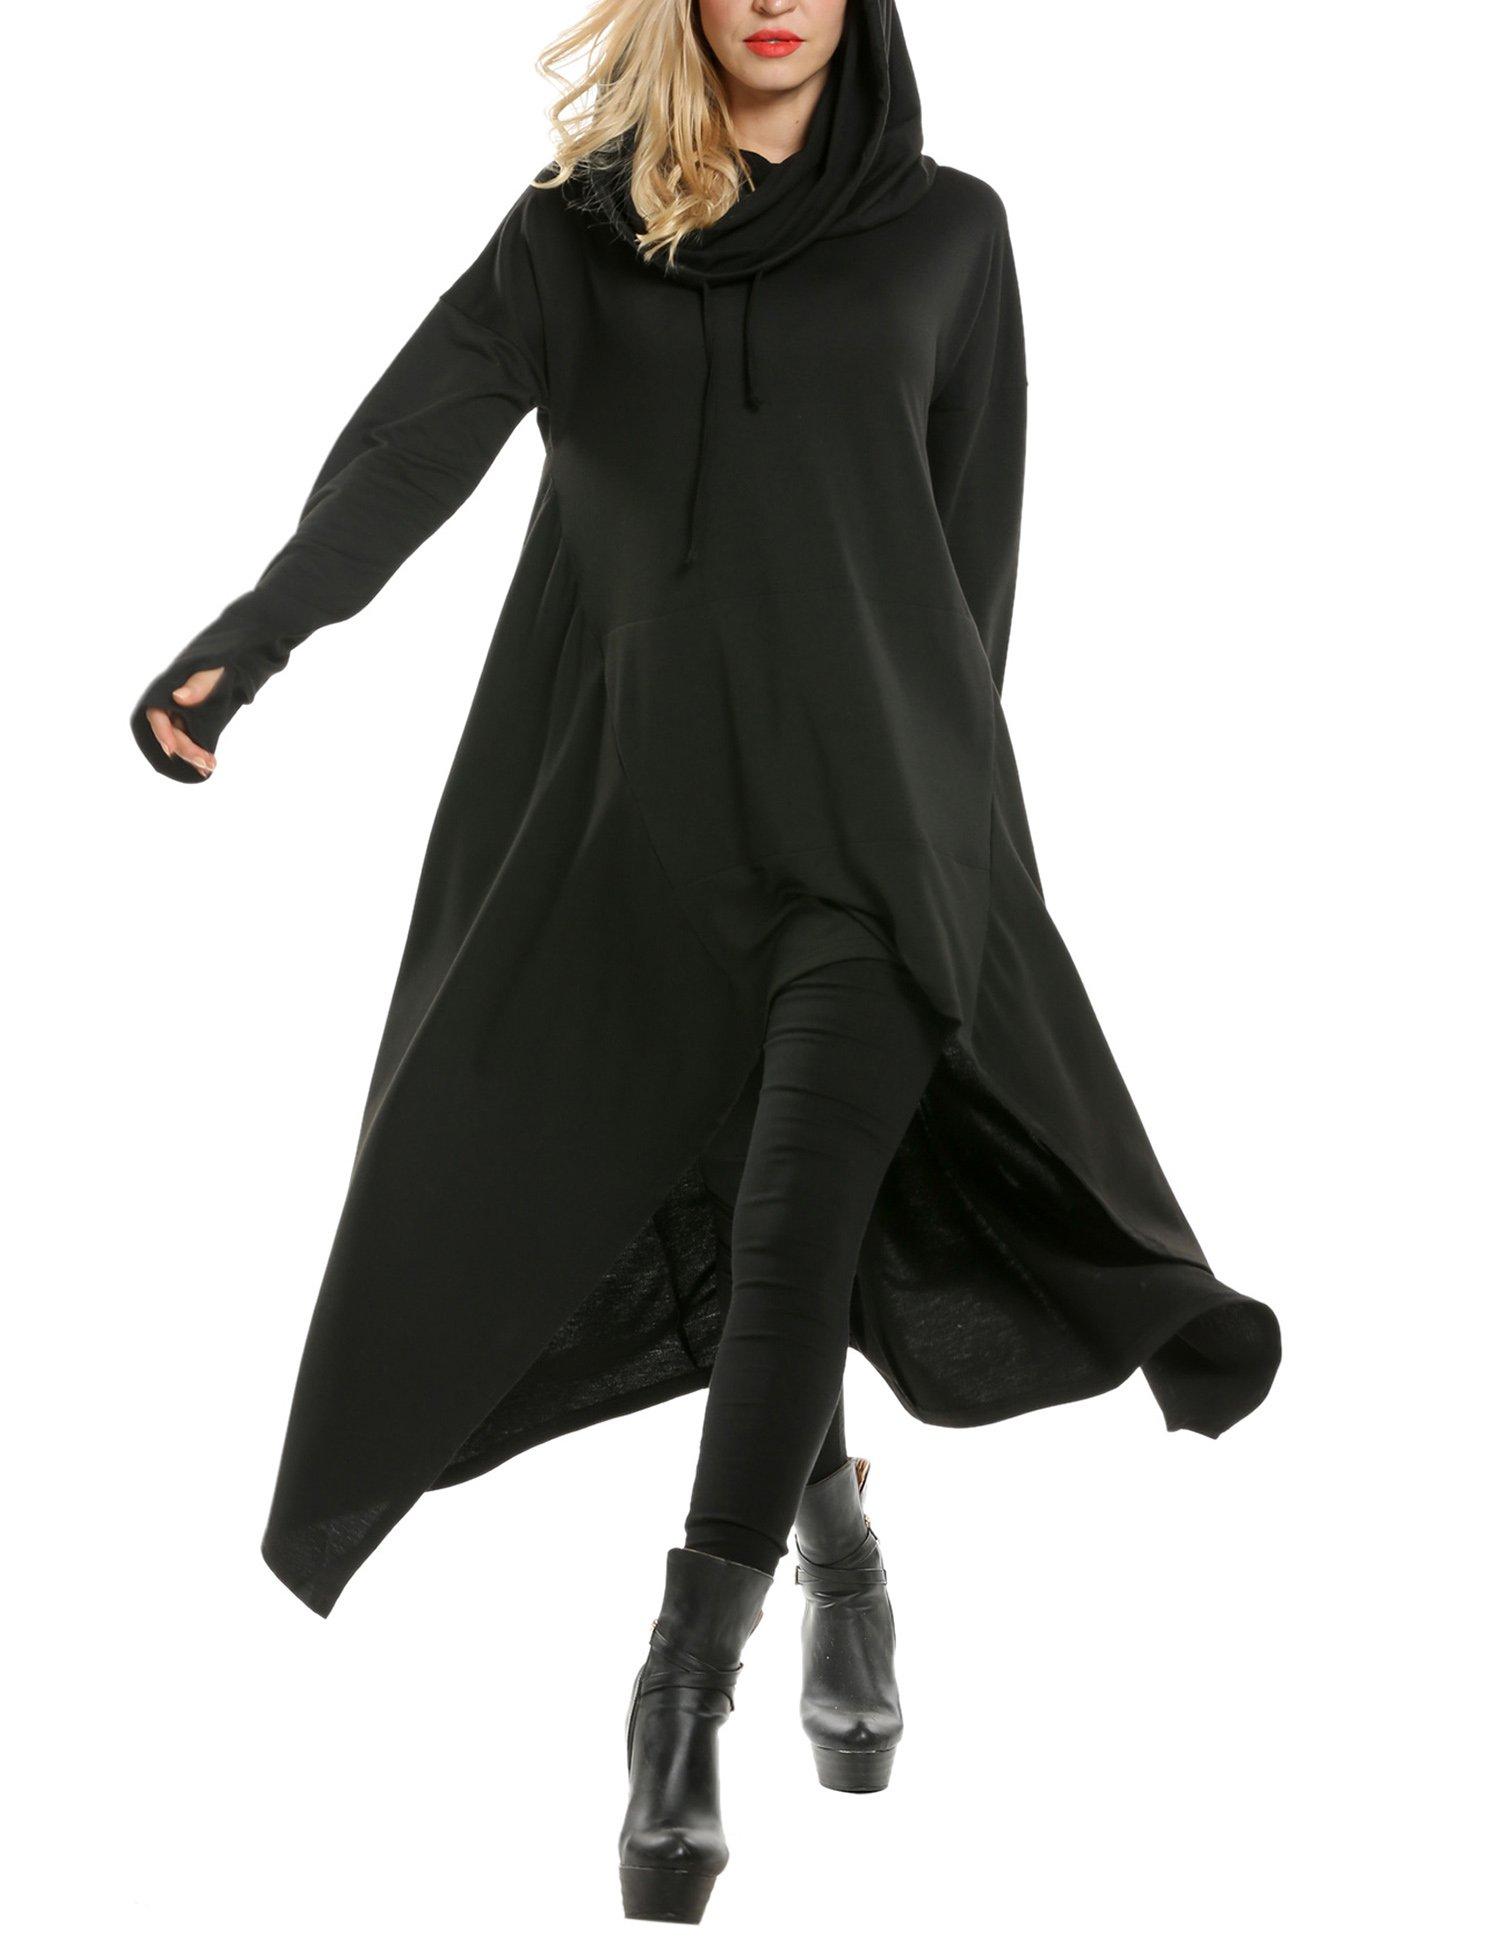 Zeagoo Women's High Low String Hoodie Tunic Sweatshirts with Pocket